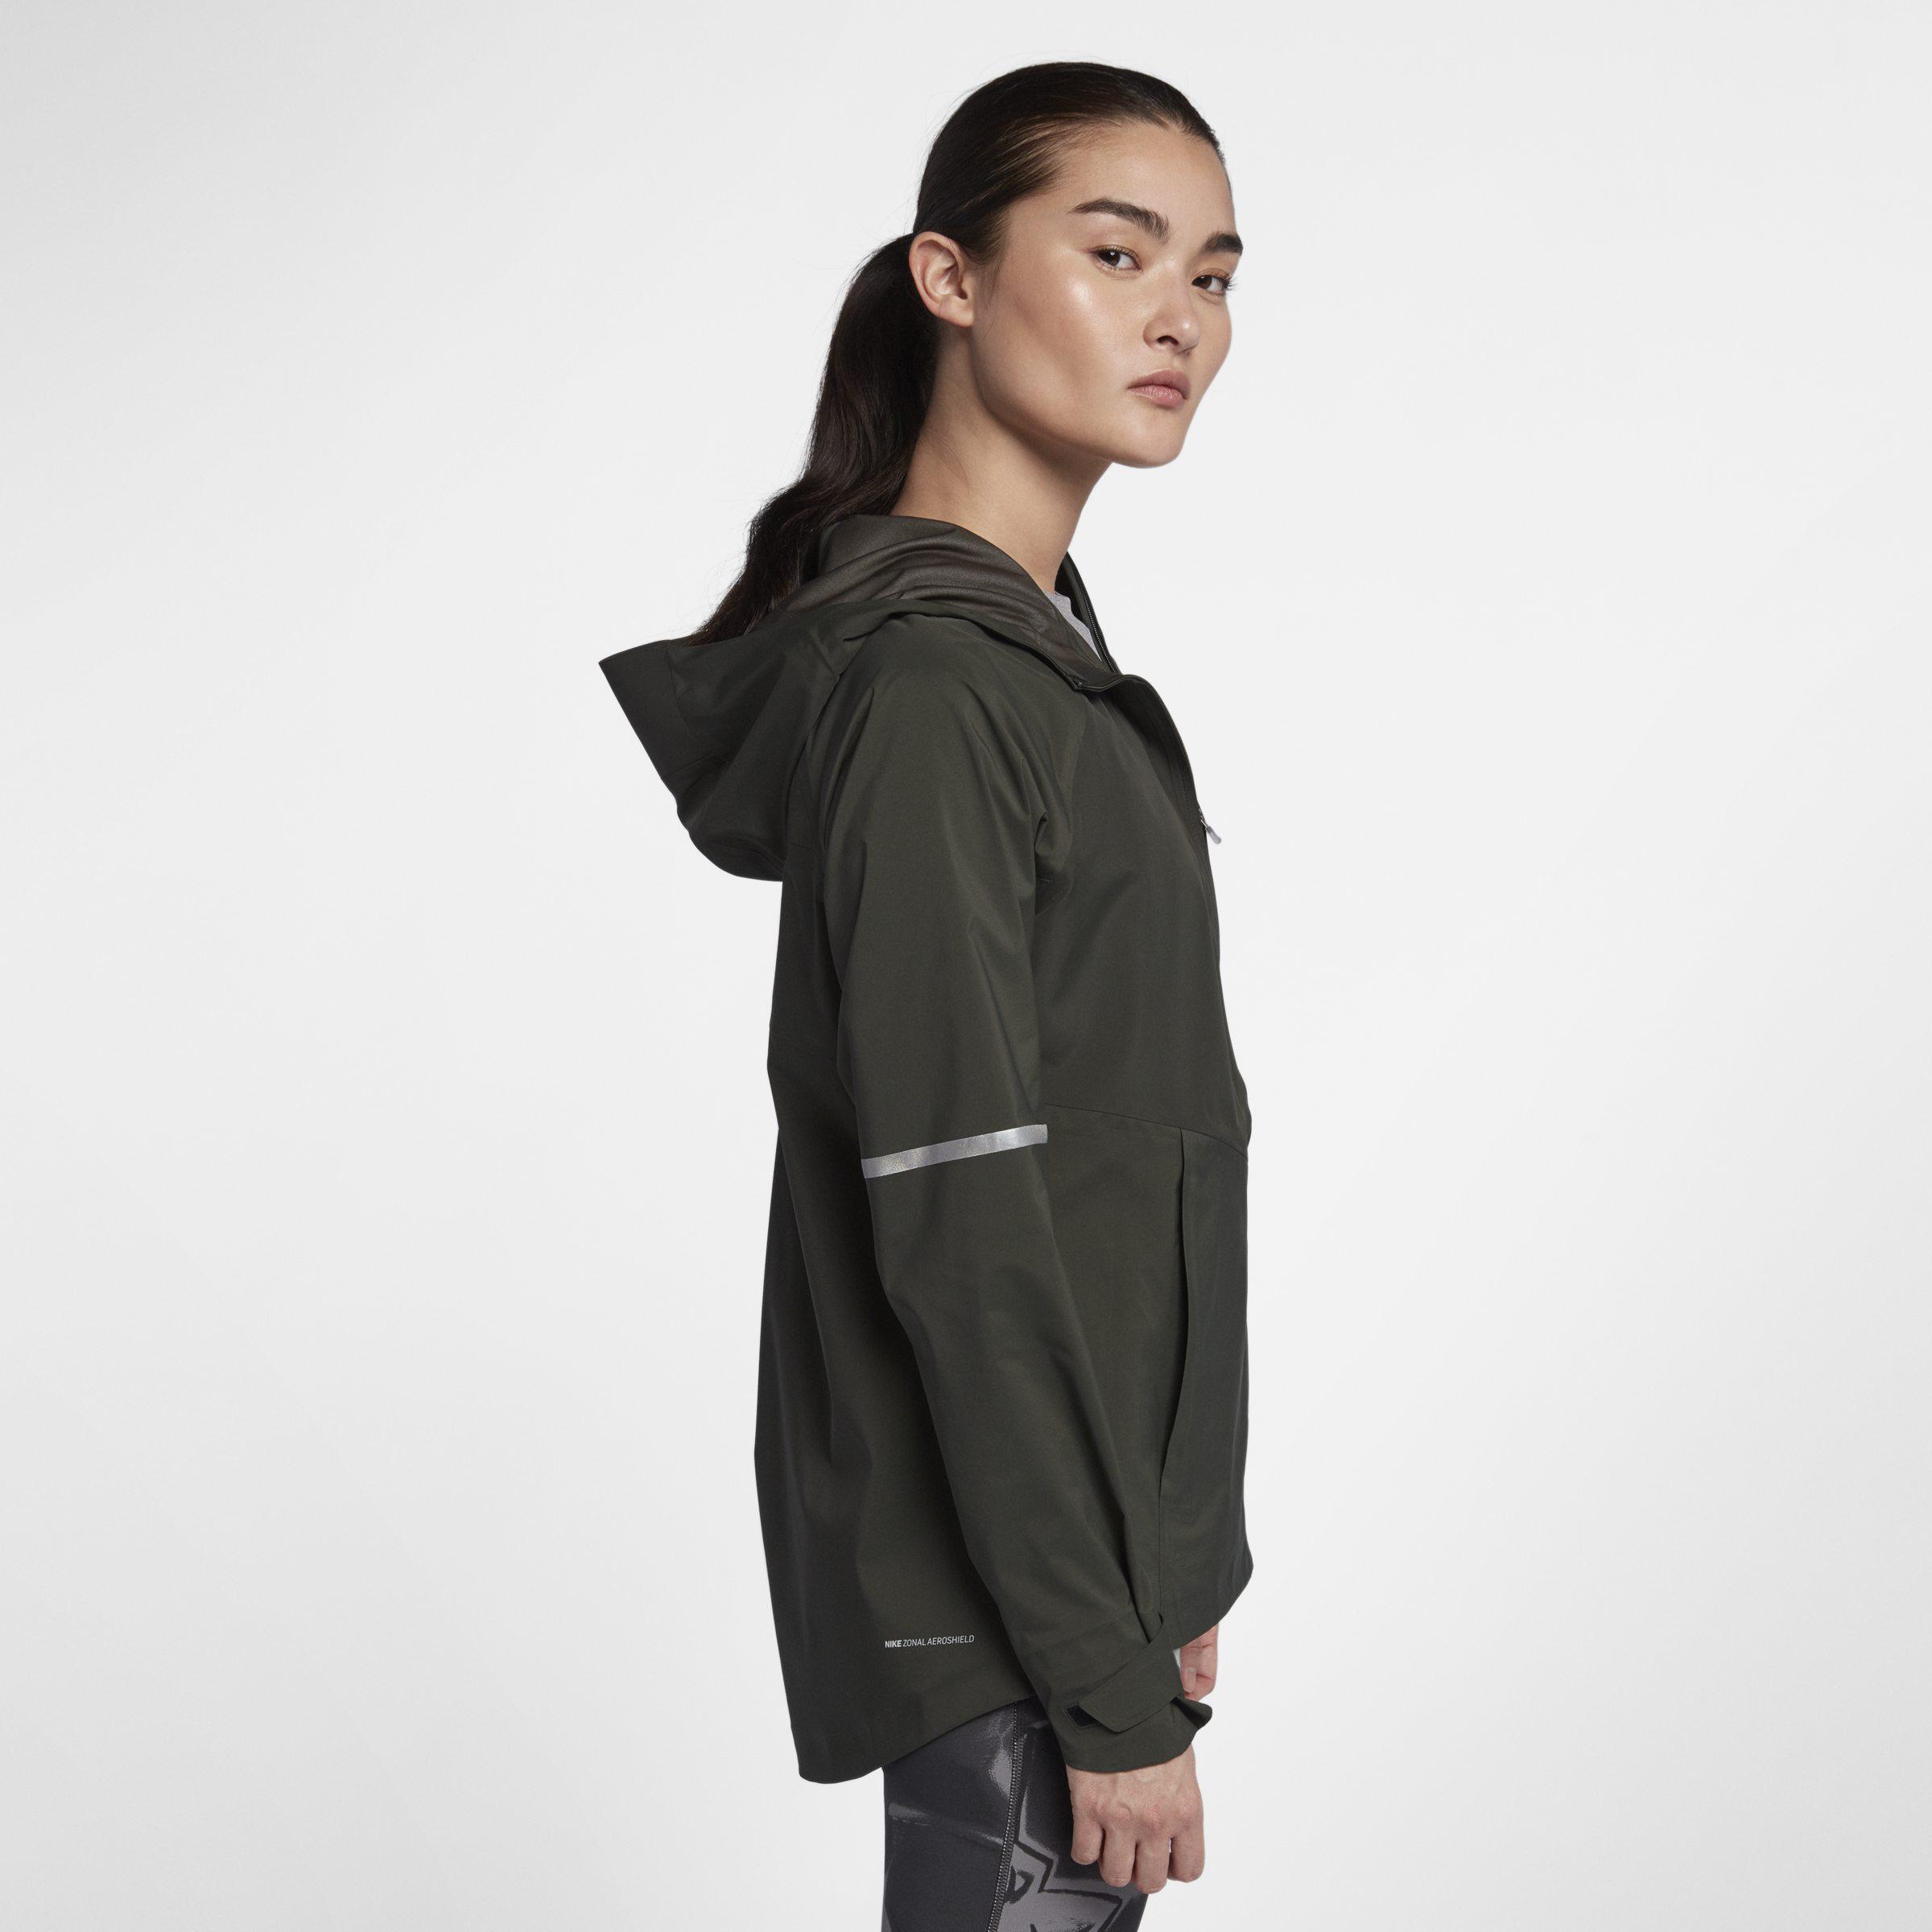 6aa10db381afd Nike Zonal Aeroshield Running Jacket in Green - Lyst